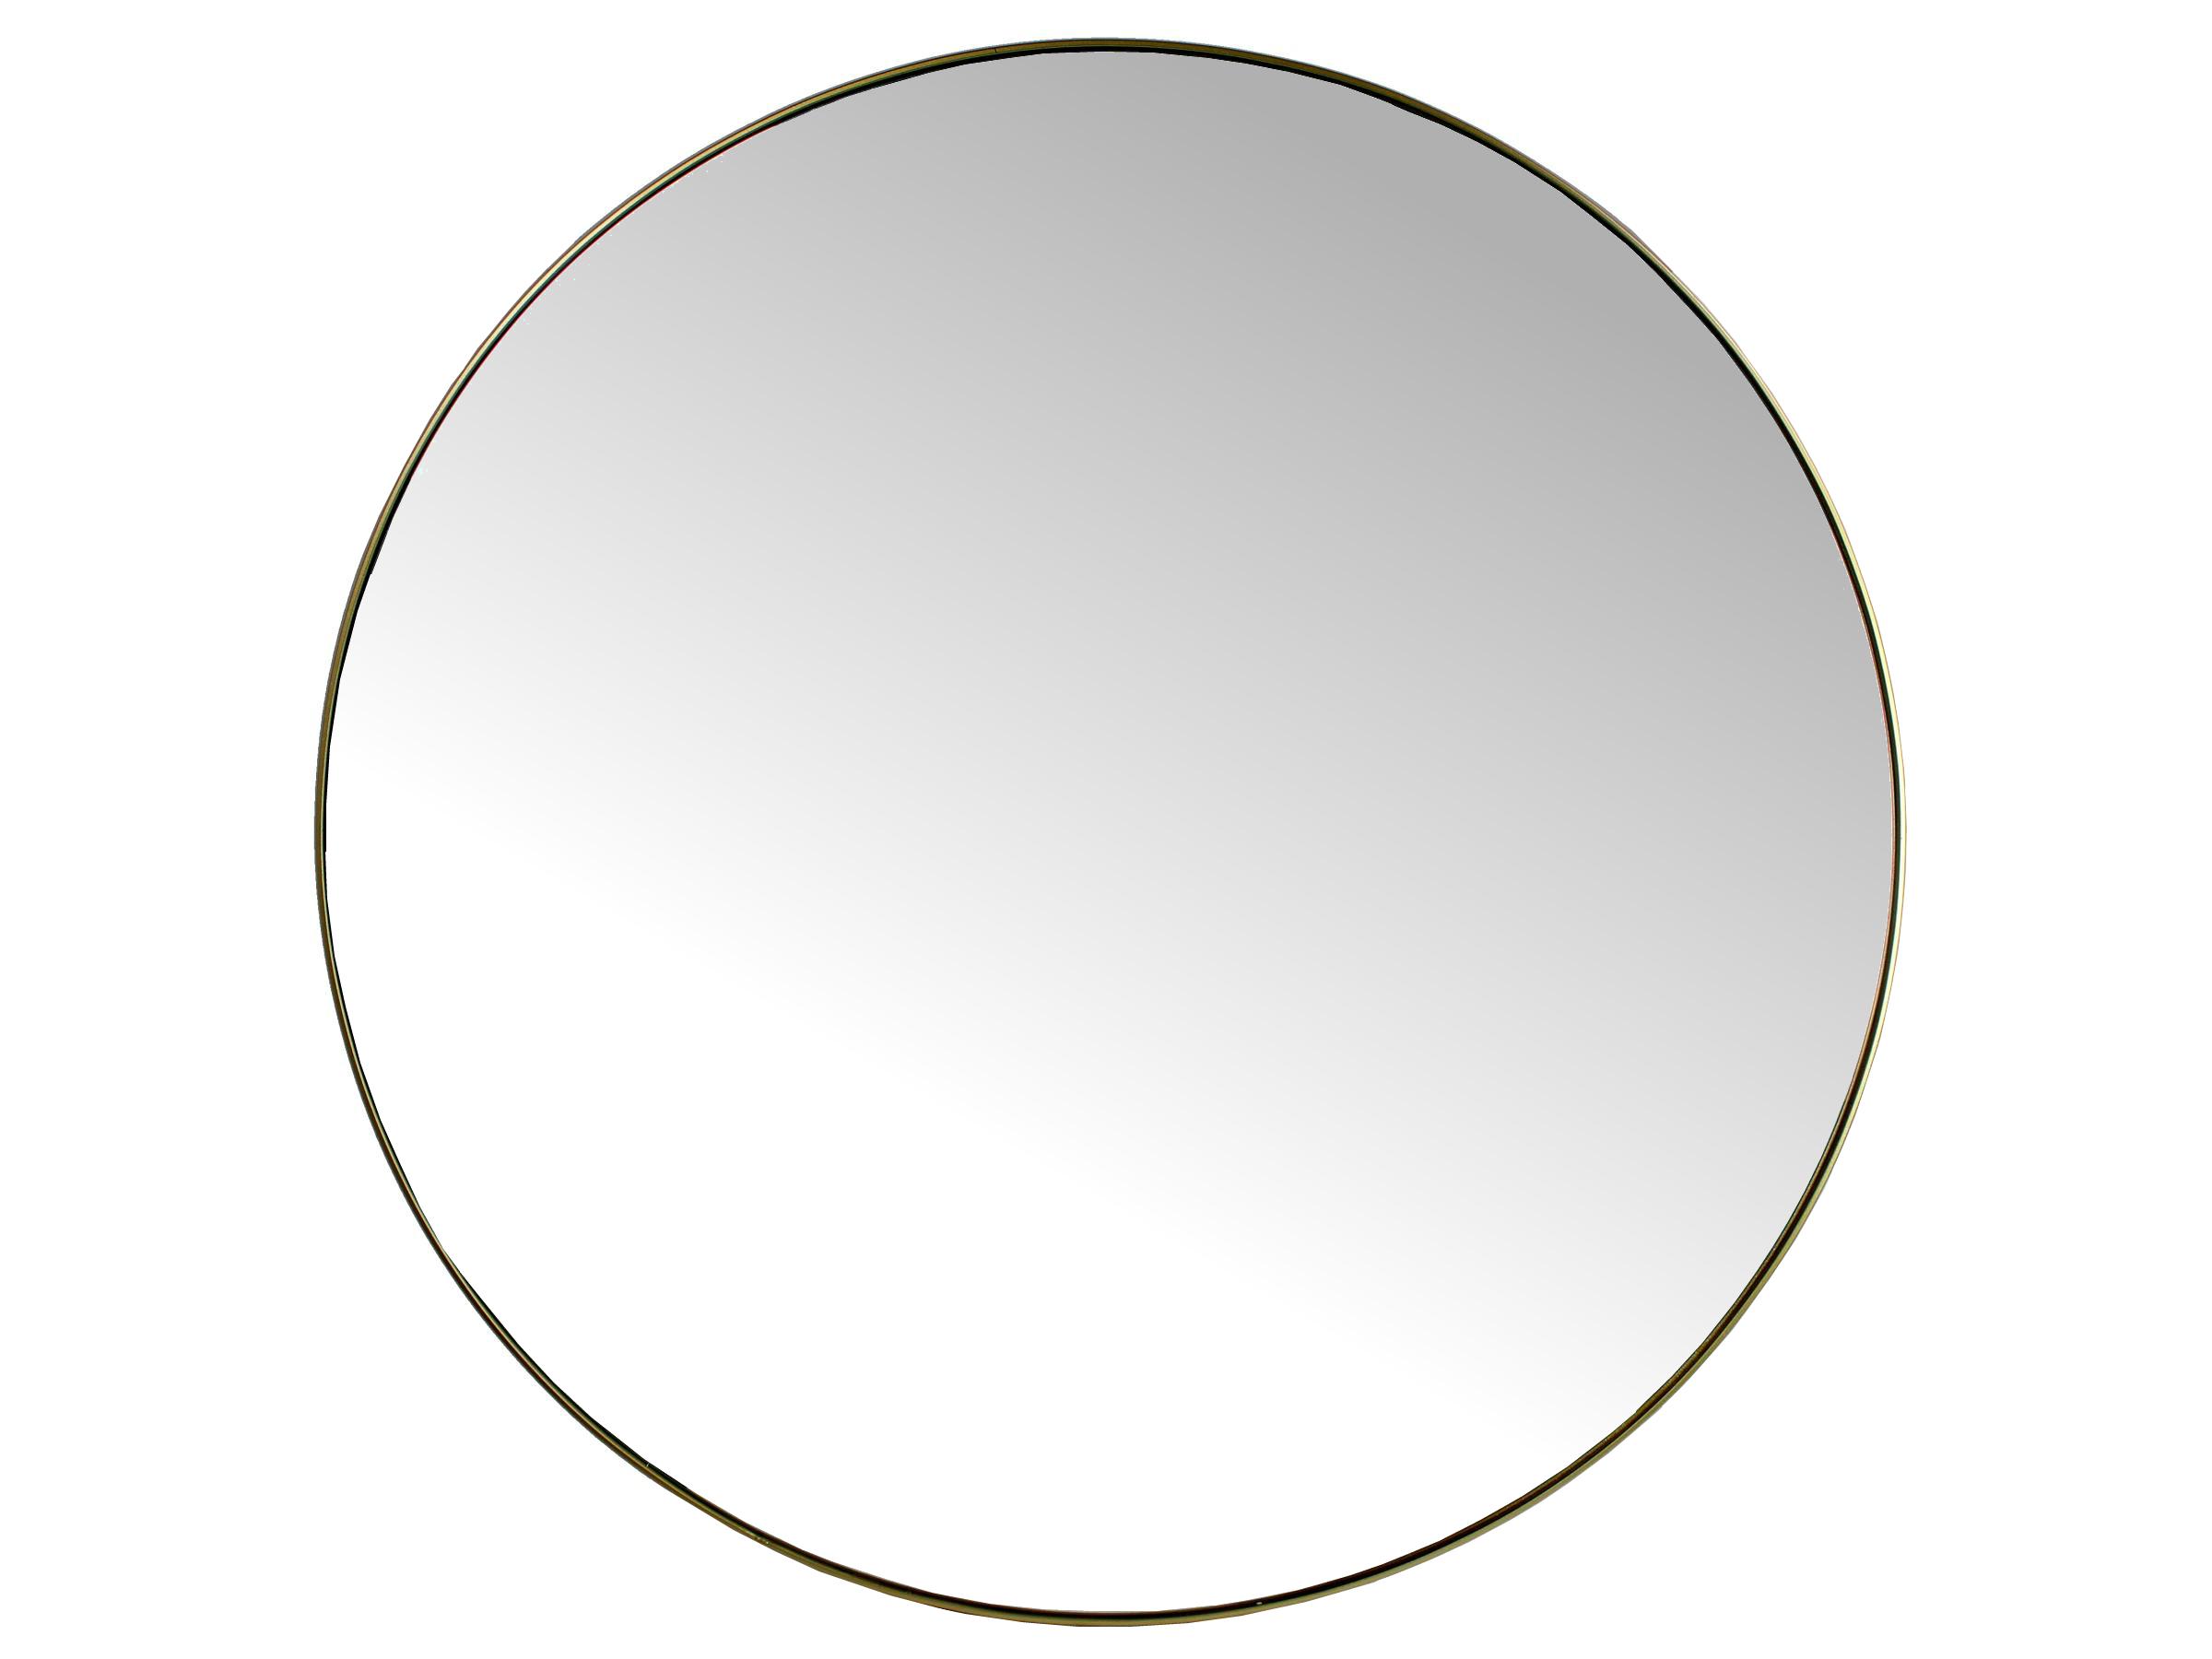 Spiegel Ø116cm x 2cm, 1 Stück